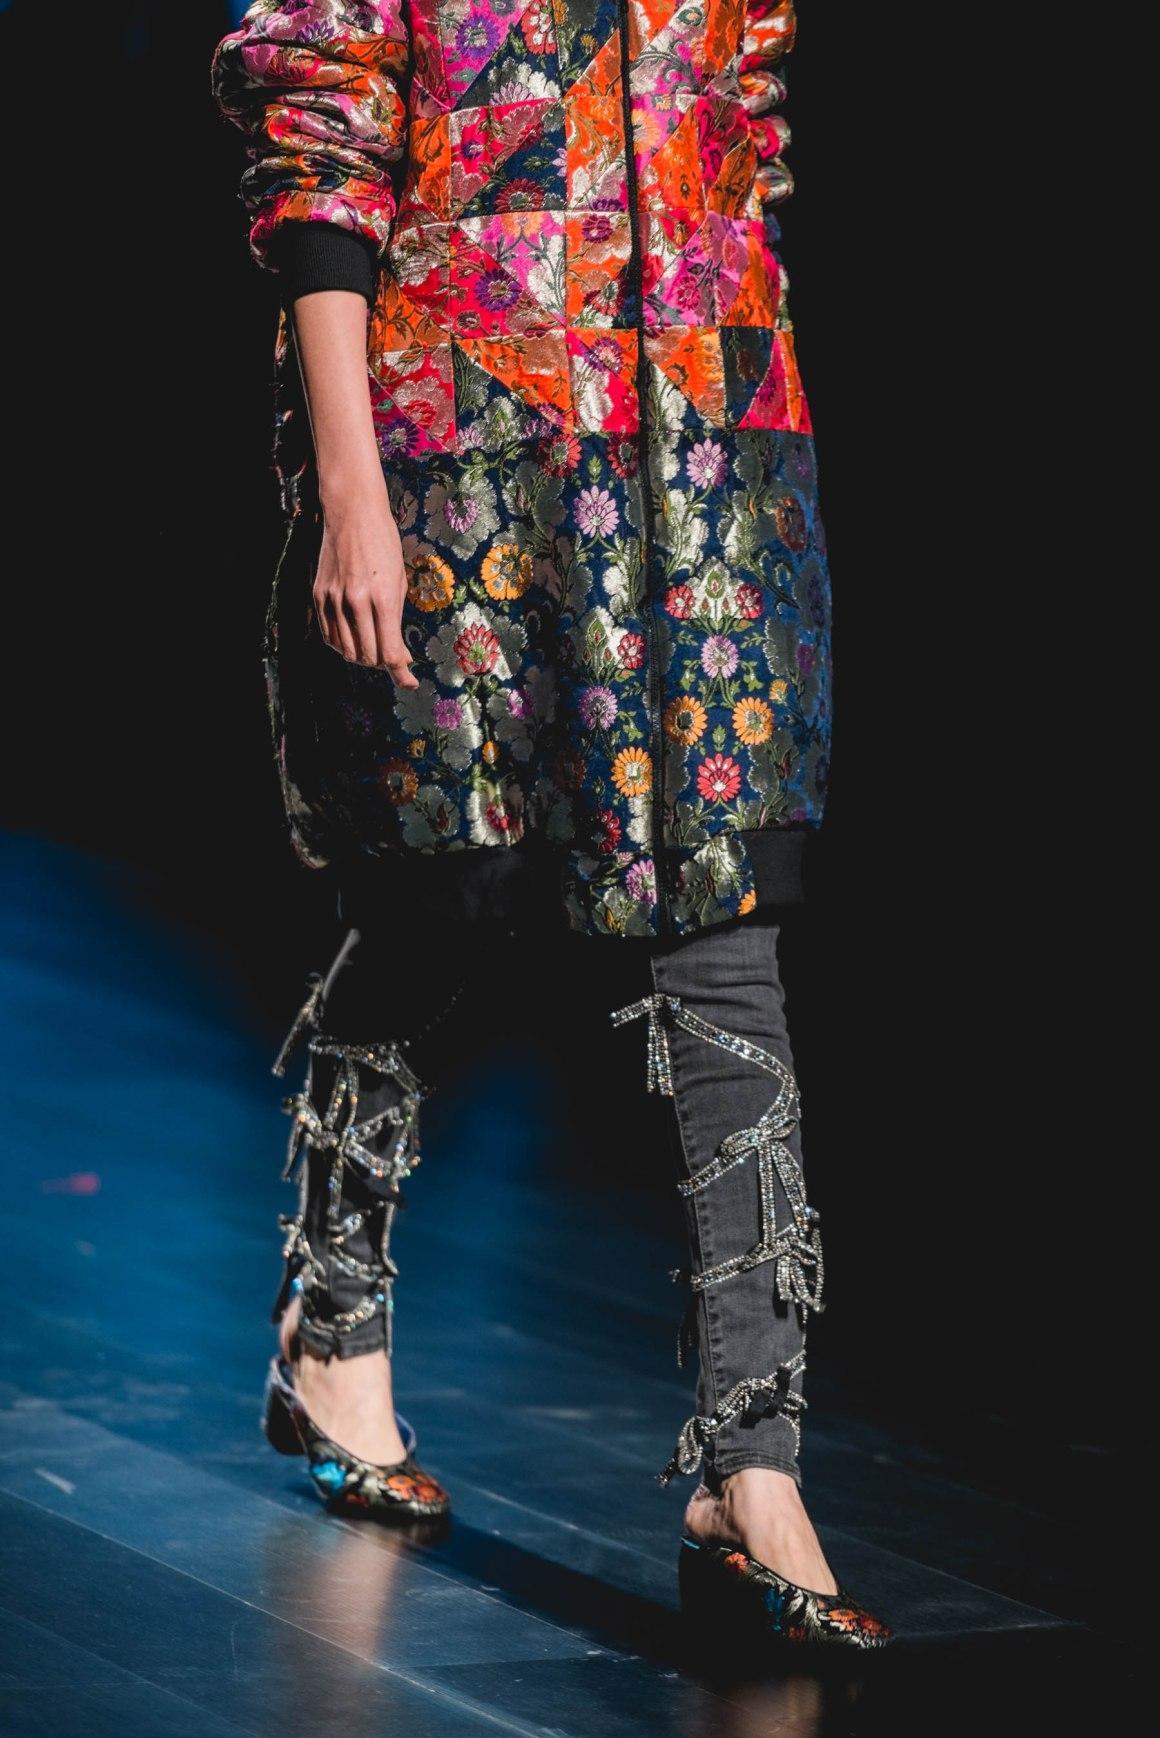 Naina Redhu, Naina.co, Australian High Commission, High Commission of Australia, Artisans of Fashion, Romance Was Born, We Are Kindred, Cassandra Harper, Roopa, Australian Fashion Designers, Australian Government, Fashion Designer, FDCI, Lotus MakeUp India Fashion Week Spring Summer 2019, LMIFWSS19, LMIFW, India Fashion Week, Fashion Week Delhi, MadeInIndia, Made In India, EyesForFashion, Professional Photographer, Blogger, Fashion Photographer, Lifestyle Photographer, Luxury Photographer, Delhi Photographer, Gurgaon Photographer, Delhi Blogger, Gurgaon Blogger, Indian Blogger